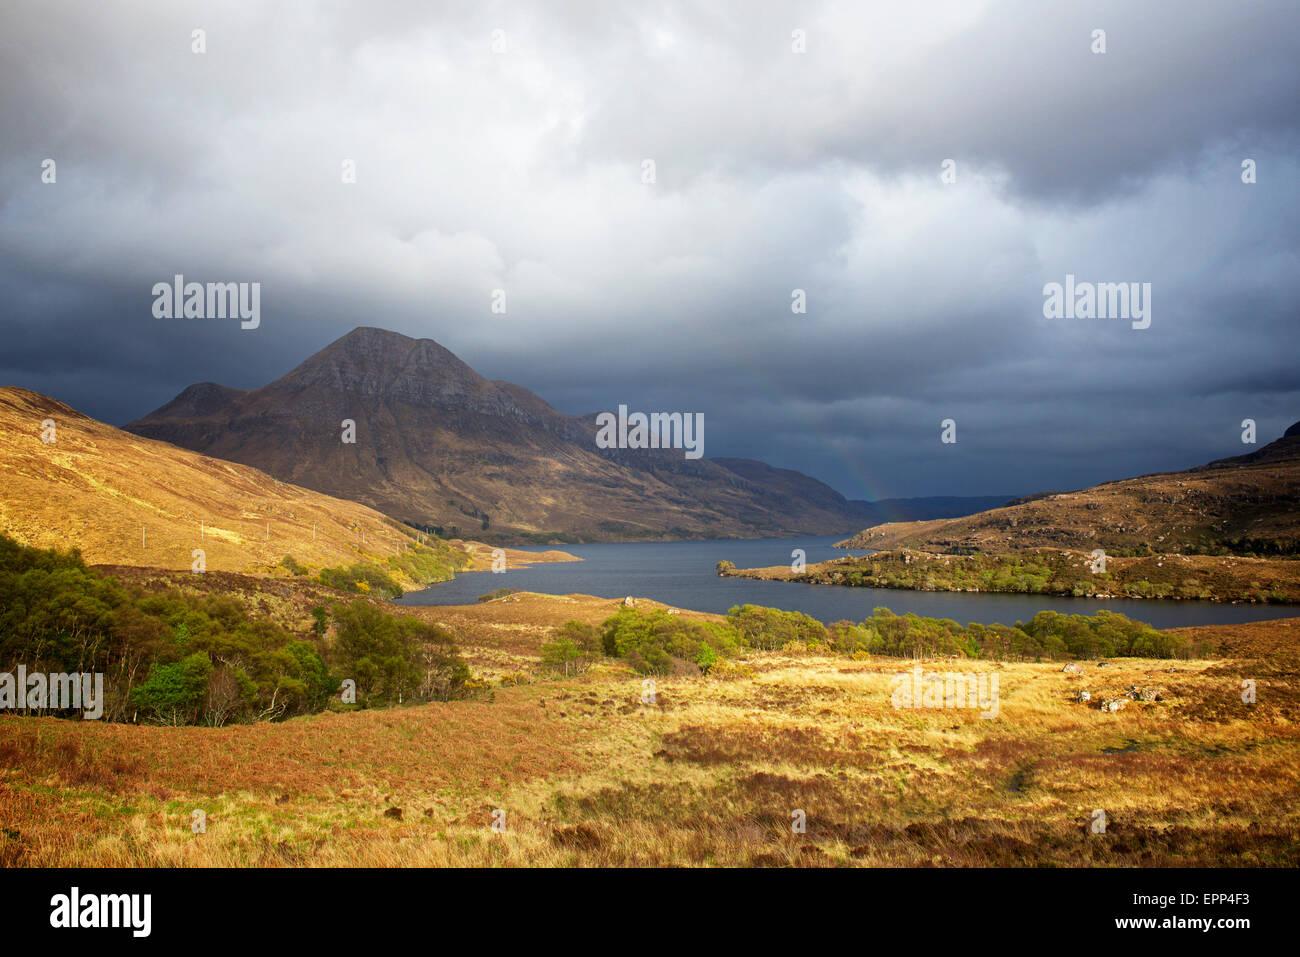 Cul Beag mountain and Loch Lurgainn, near Ullapool, Ross-shire, Scottish Highlands, Scotland UK - Stock Image